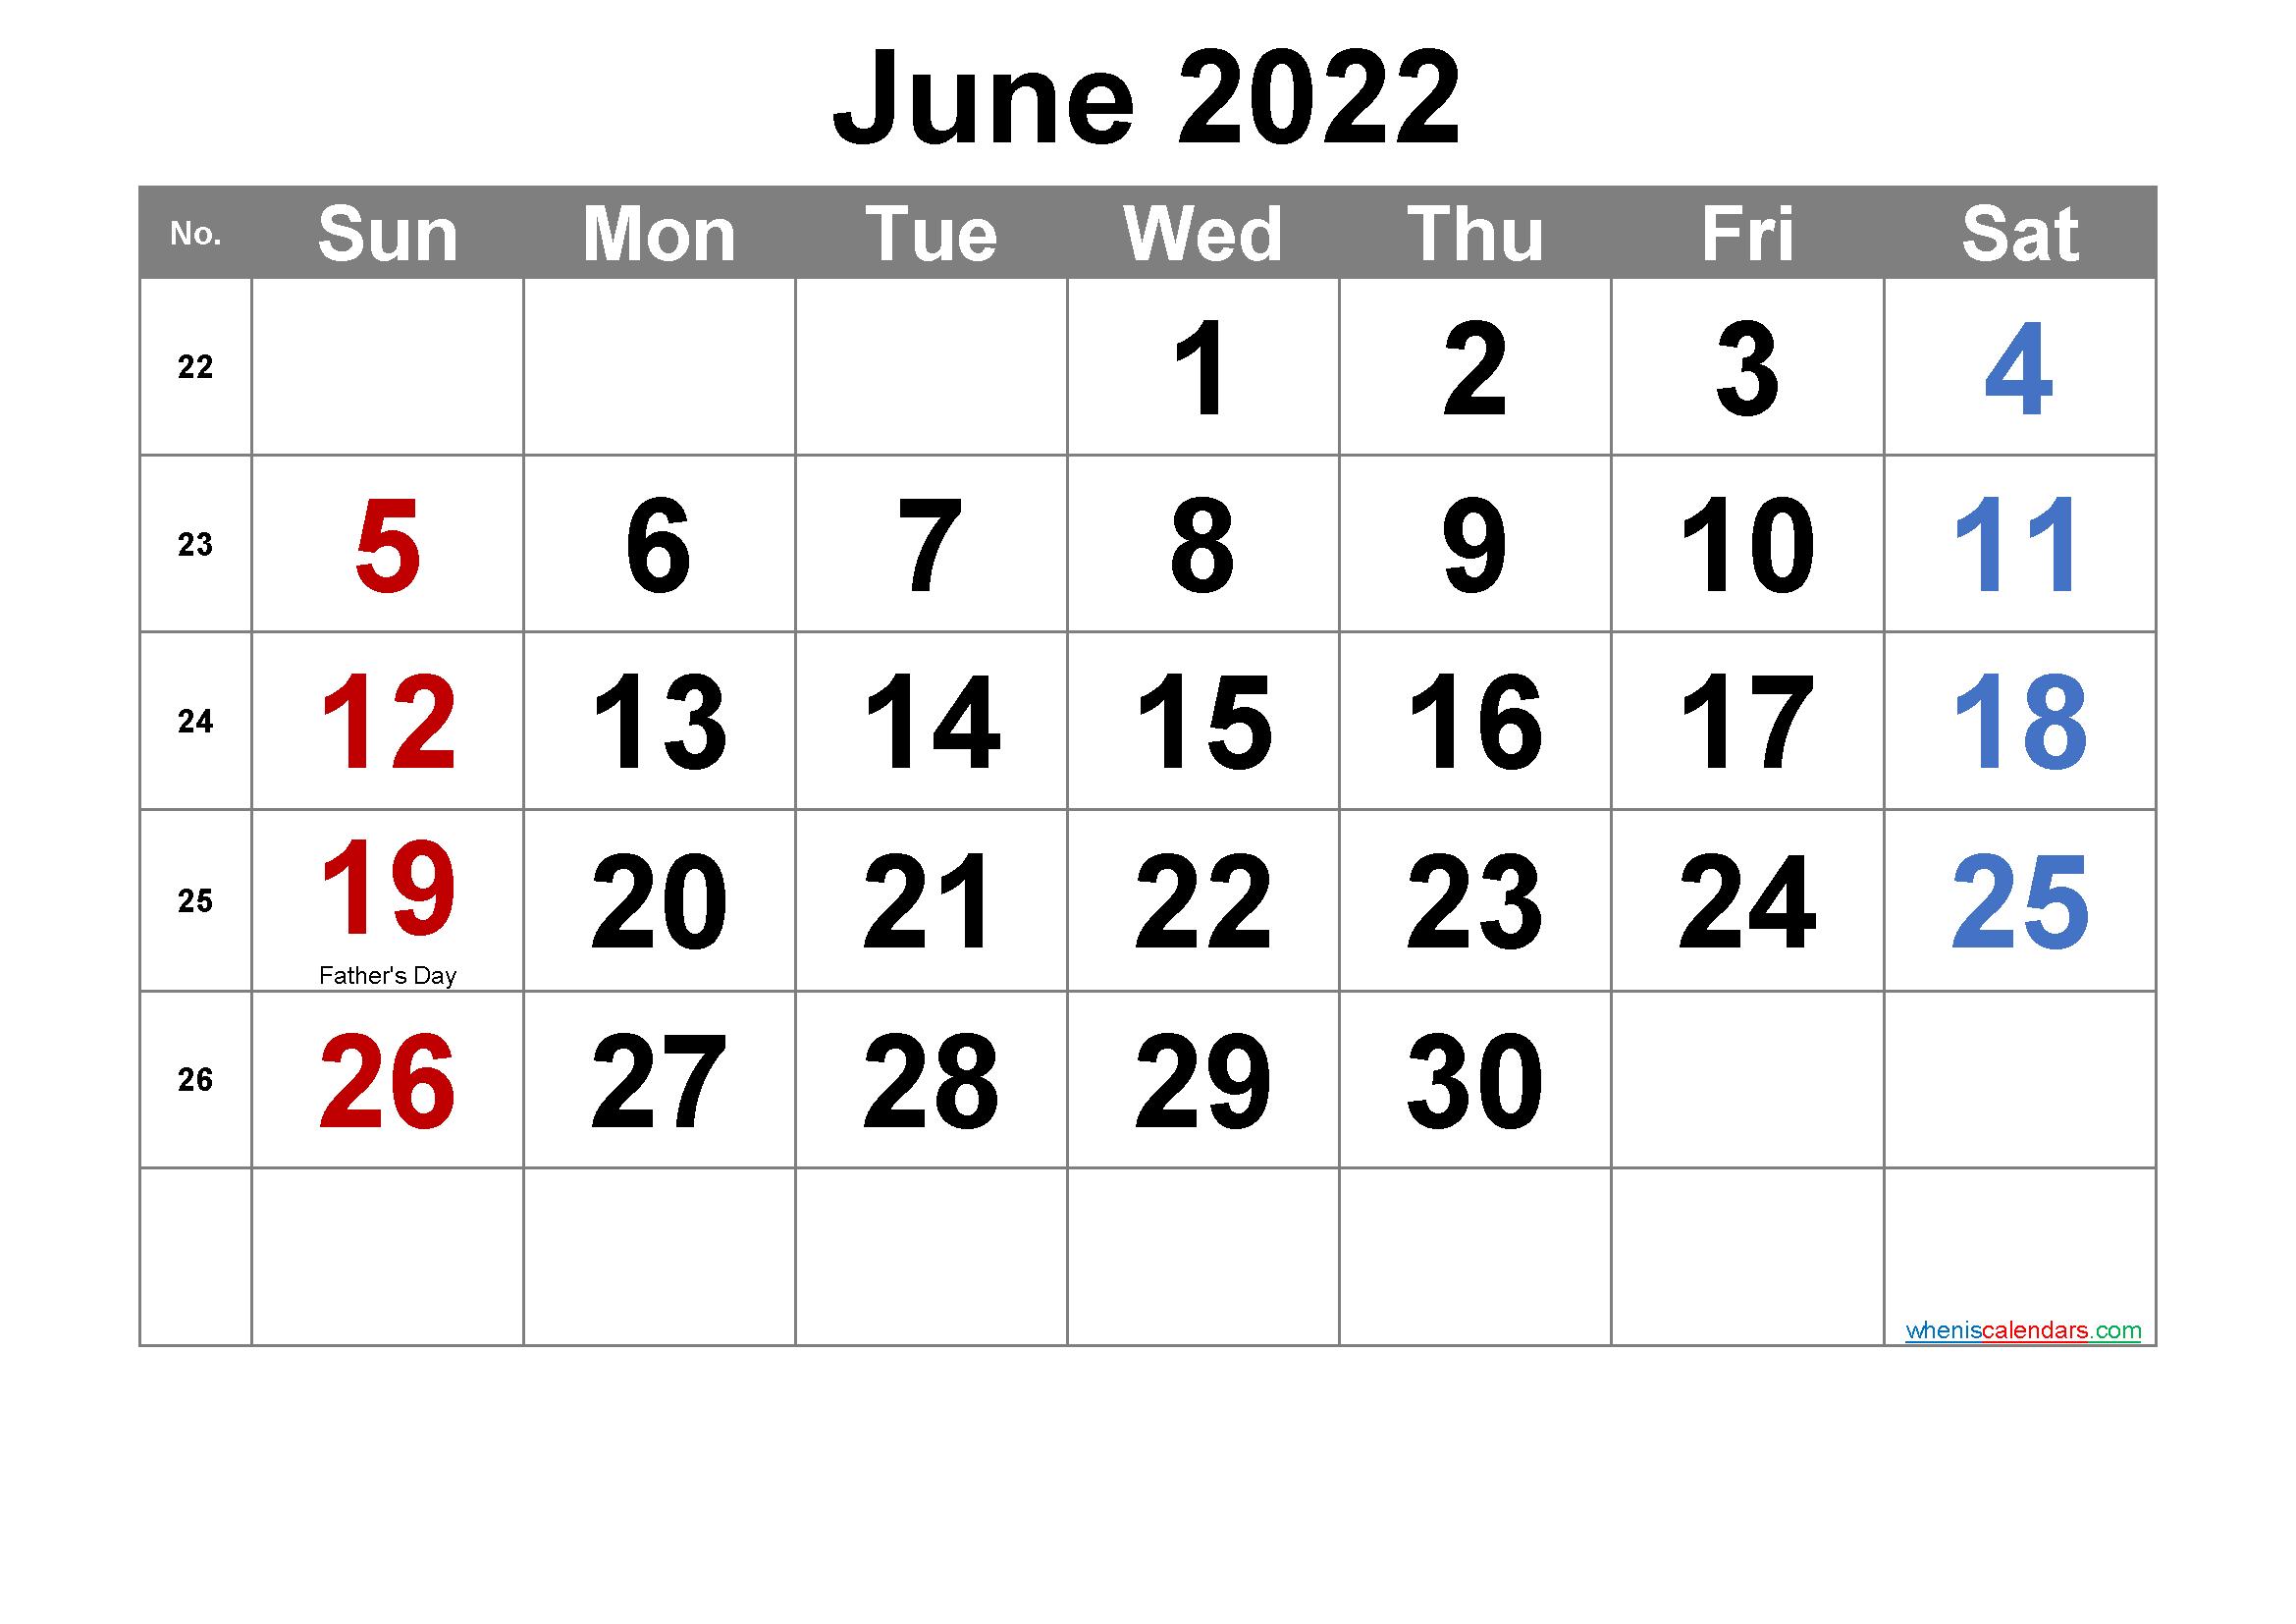 Blank Calendar For June 2022.Free Printable June 2022 Calendar Pdf And Png Calendar Printables Printable Calendar Template 2021 Calendar